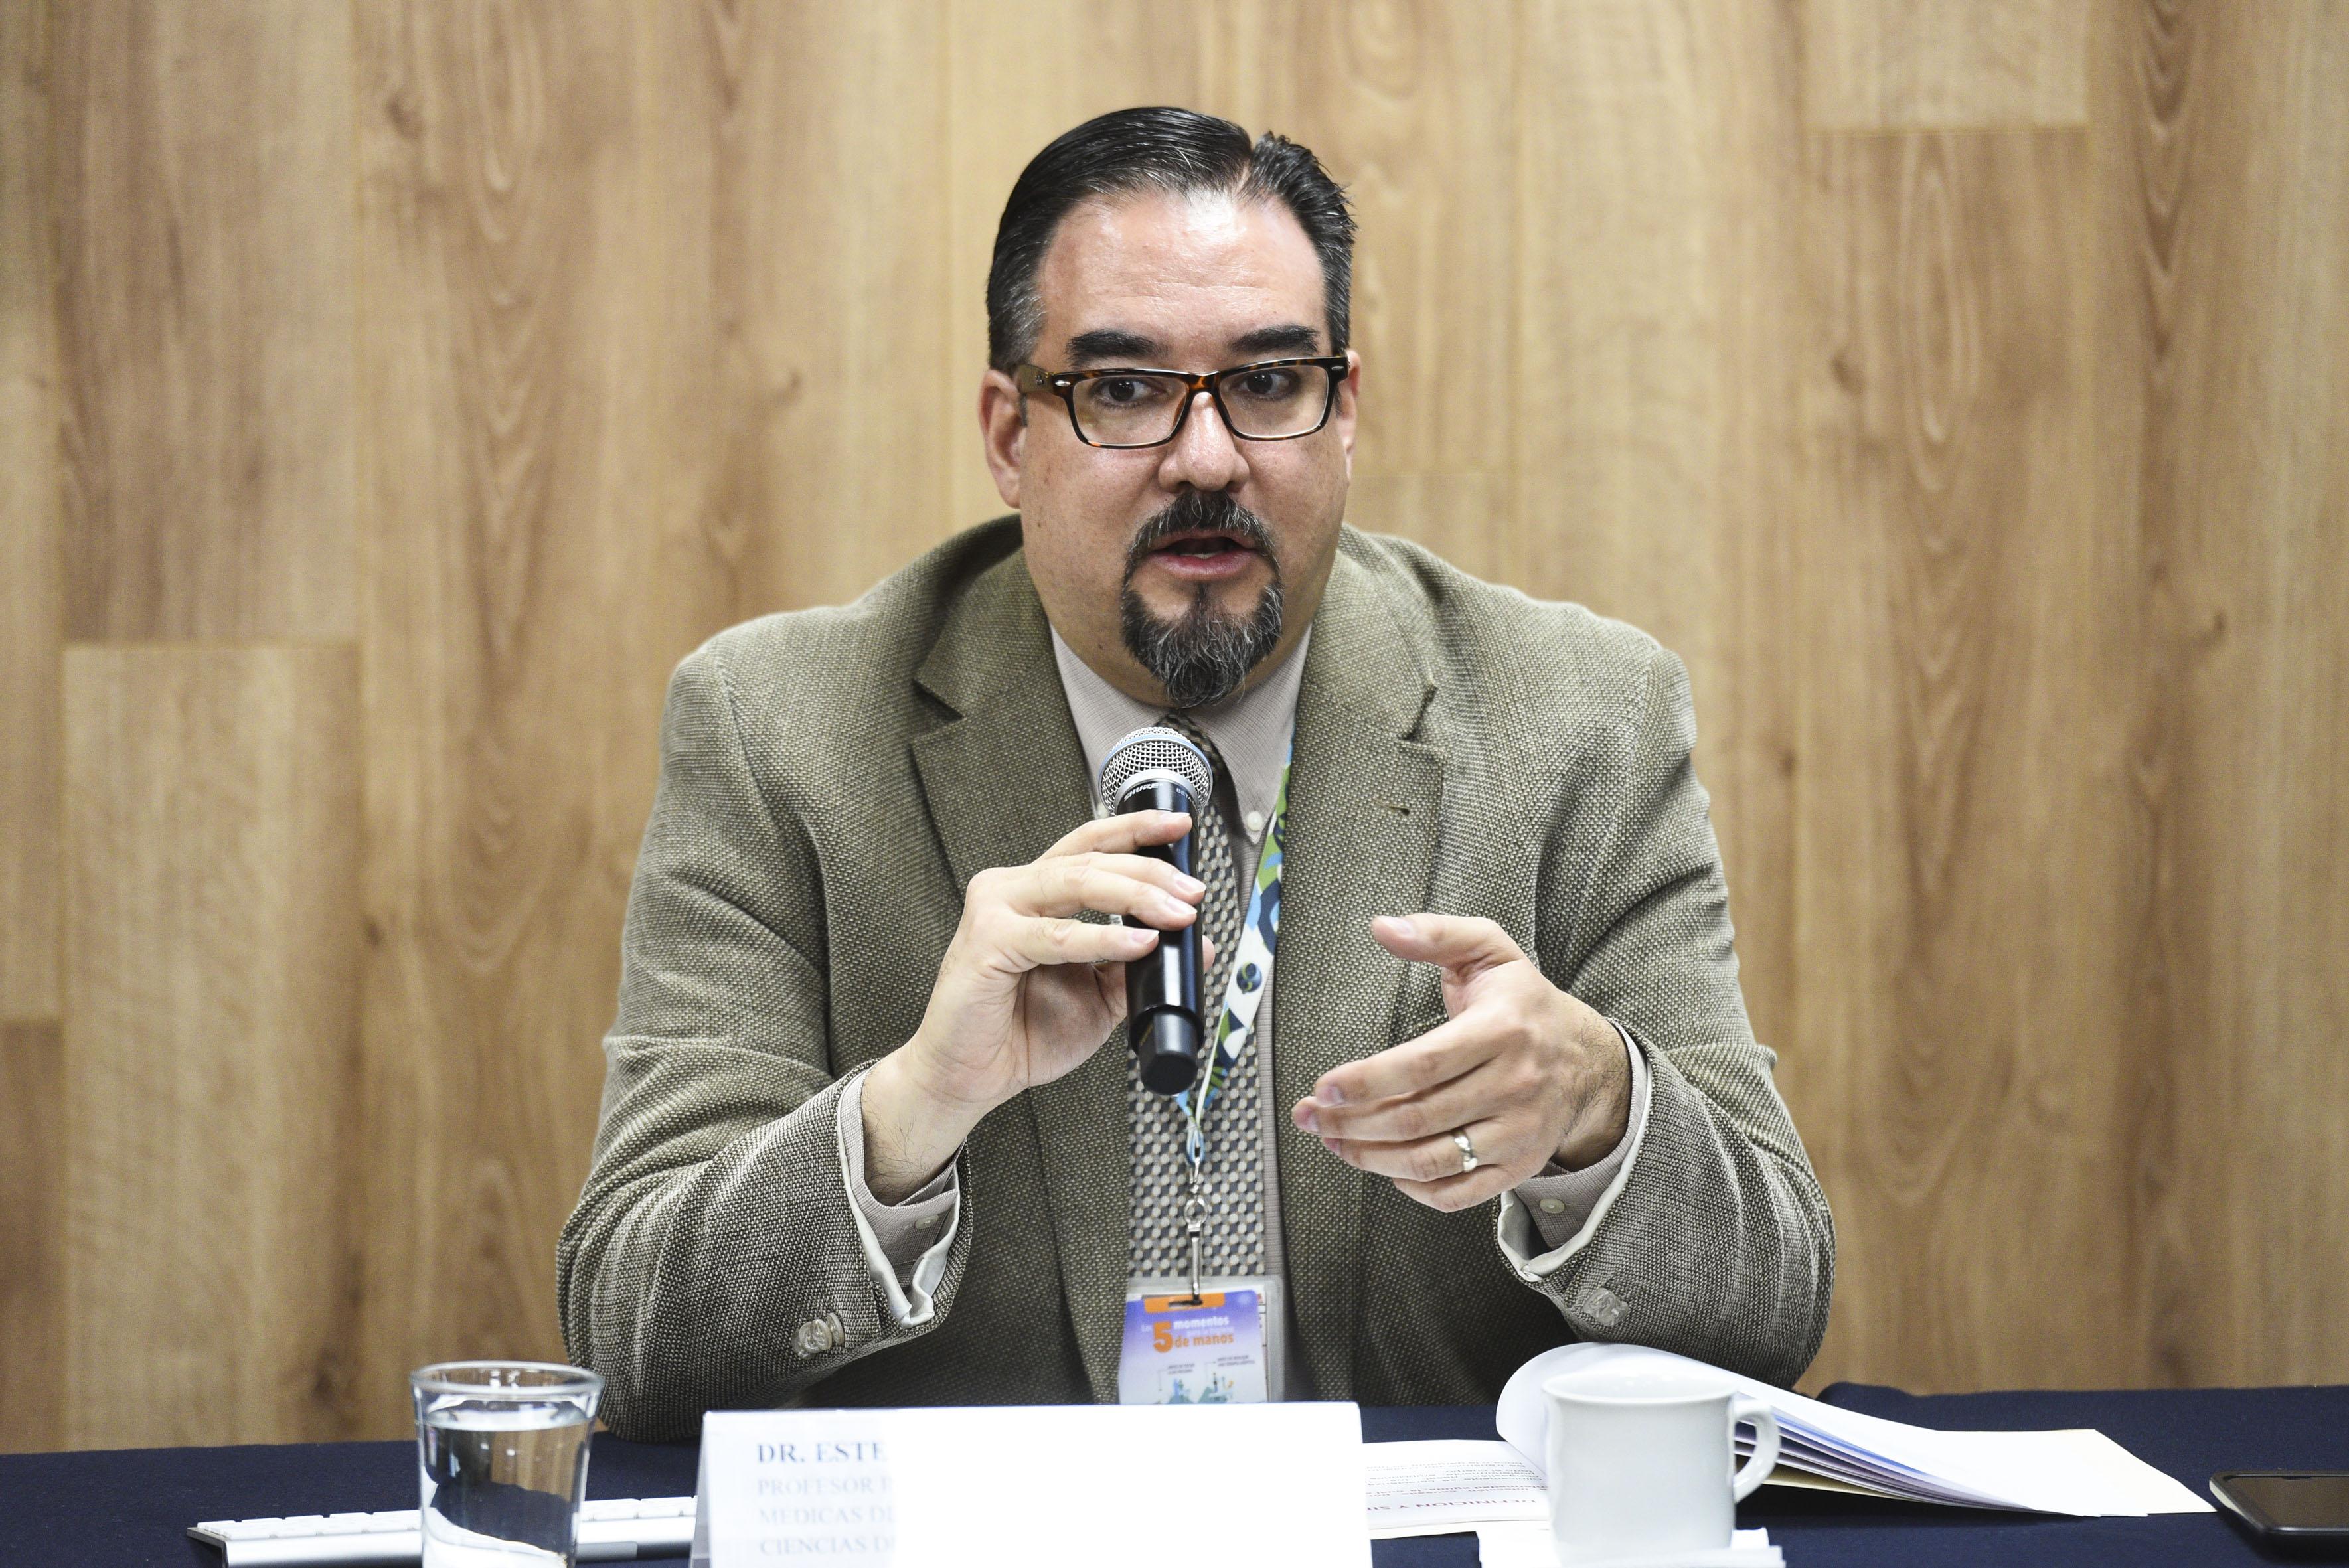 Dr. Esteban González tomando la palabra